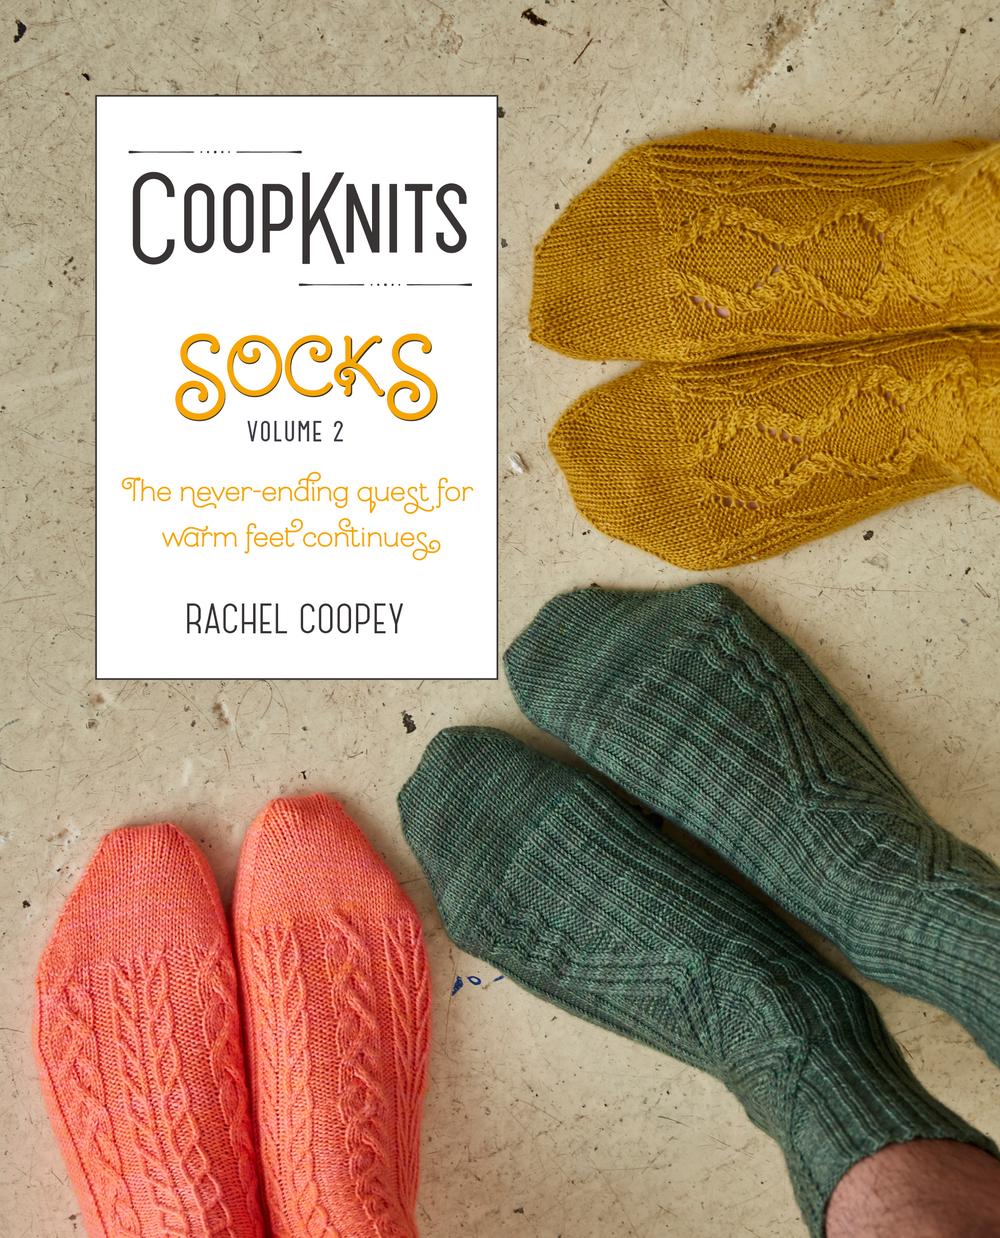 Coop Knits Socks Vol 2